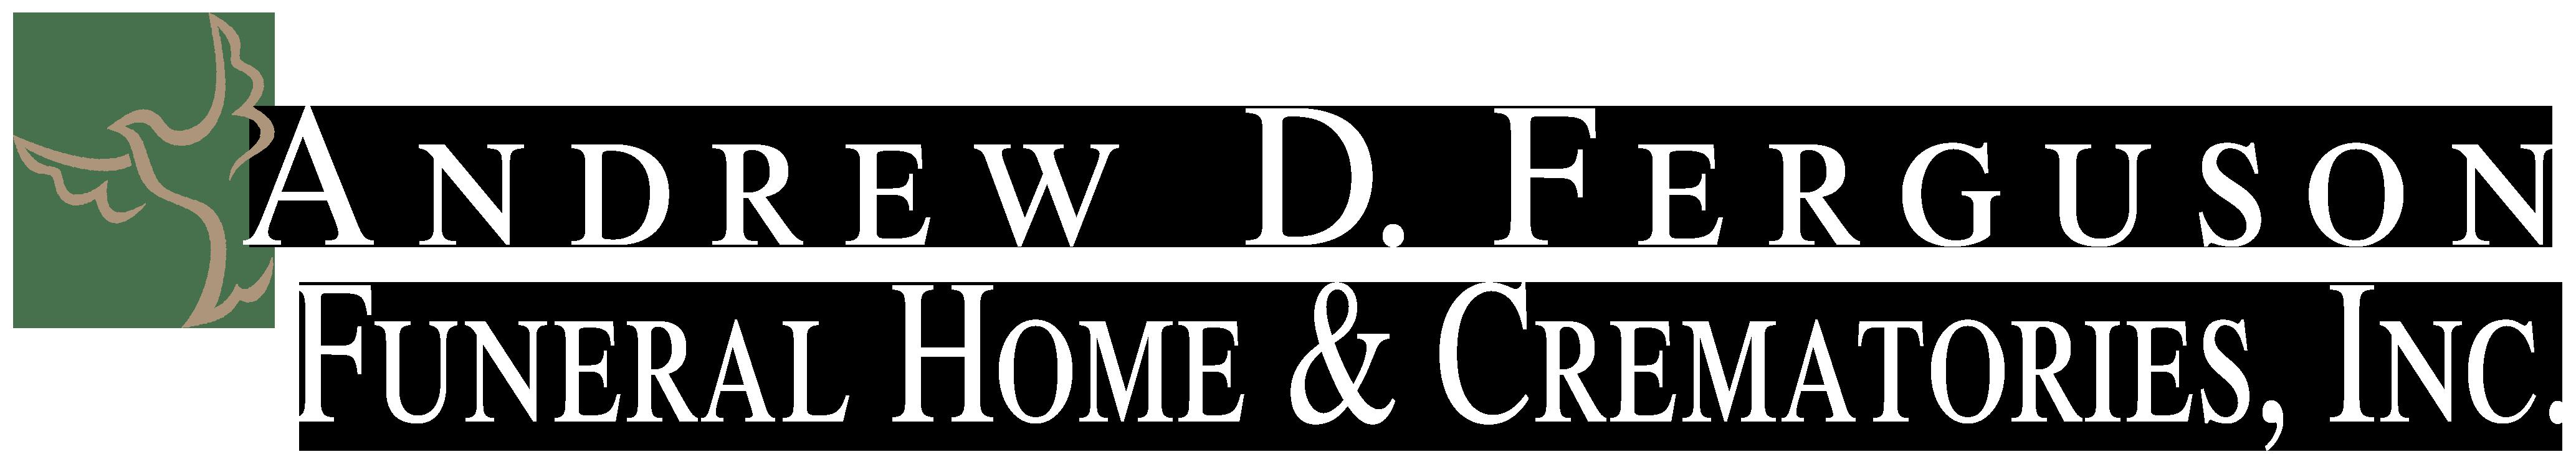 Andrew D. Ferguson Funeral Home & Crematories, Inc.